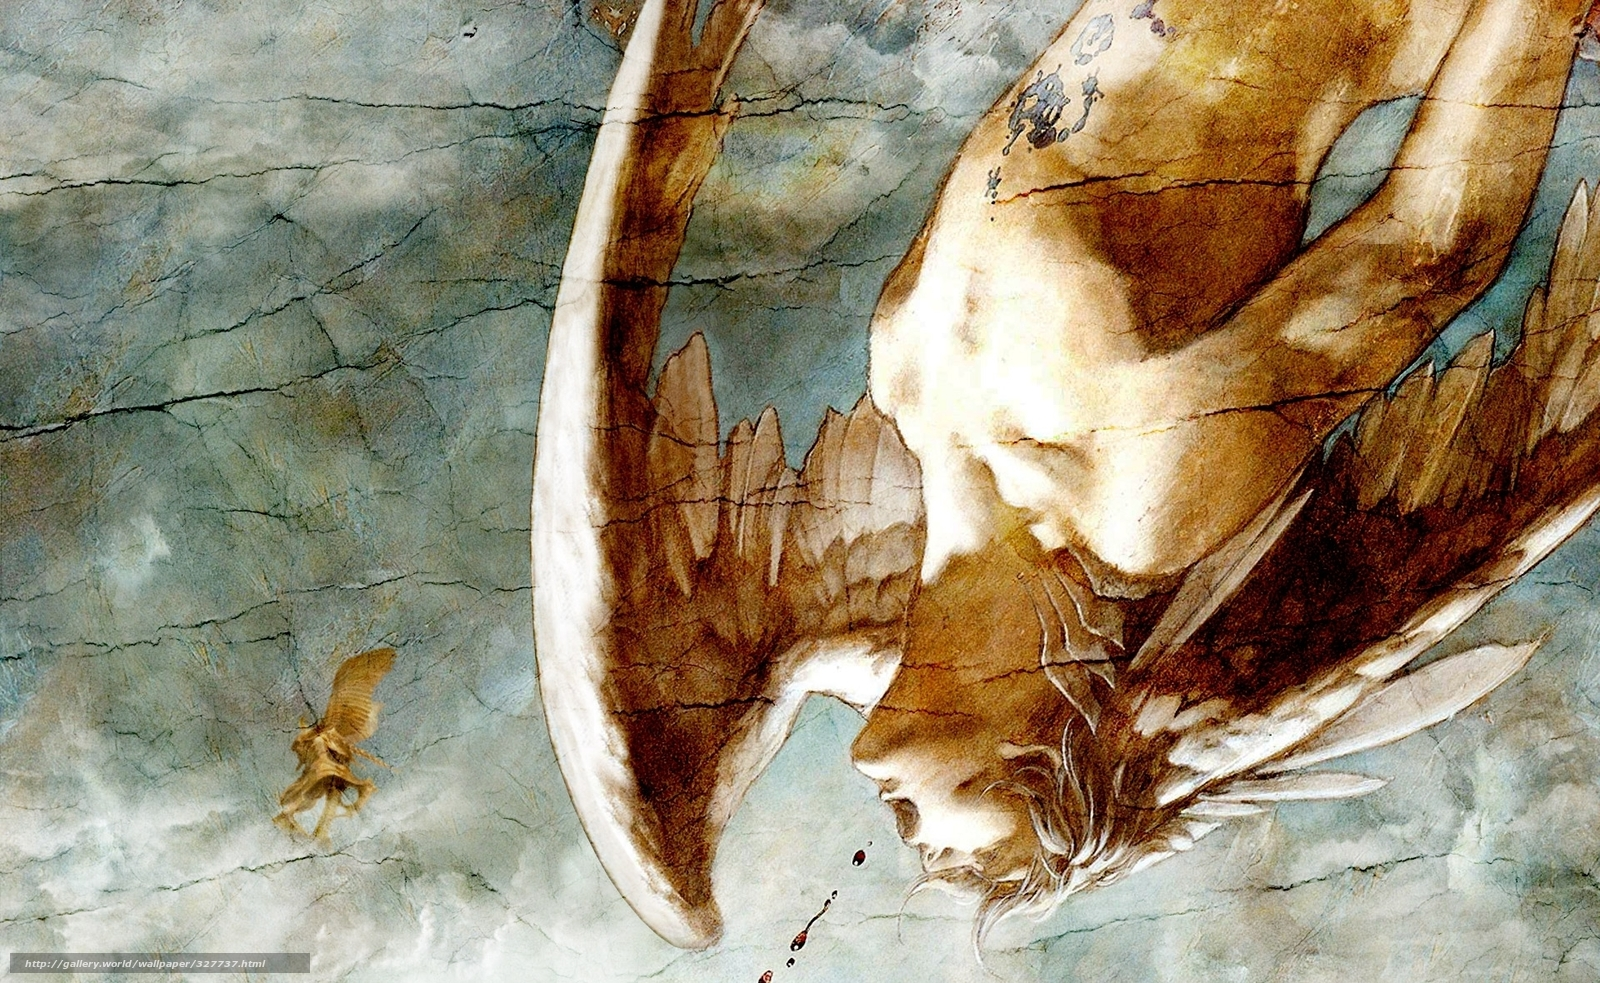 Download wallpaper angel man mural wings free desktop for Angel wall mural